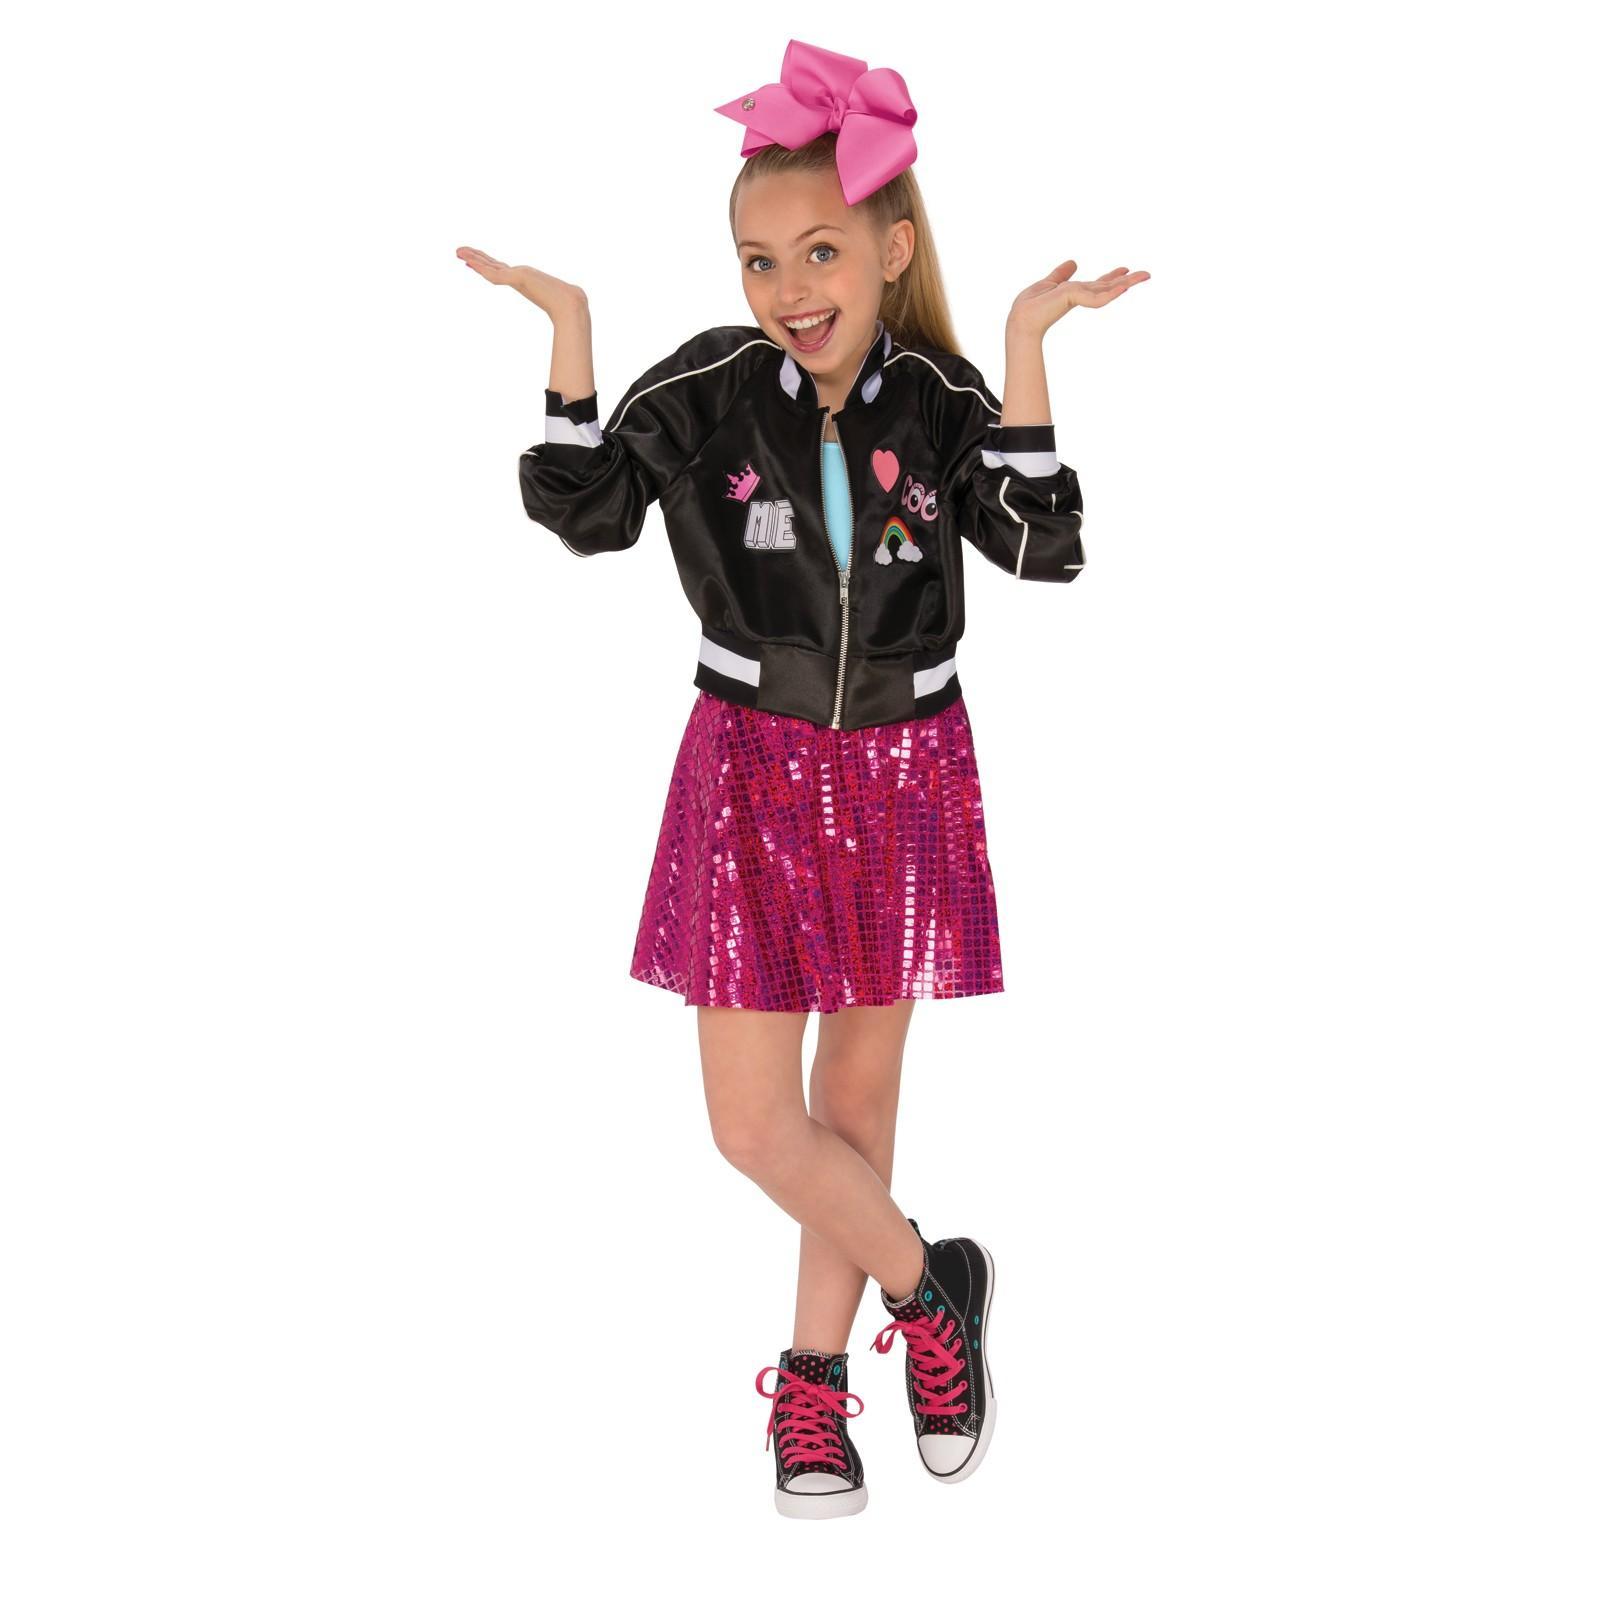 sc 1 st  Tanga & JoJo Siwa Girls Jacket - Tanga